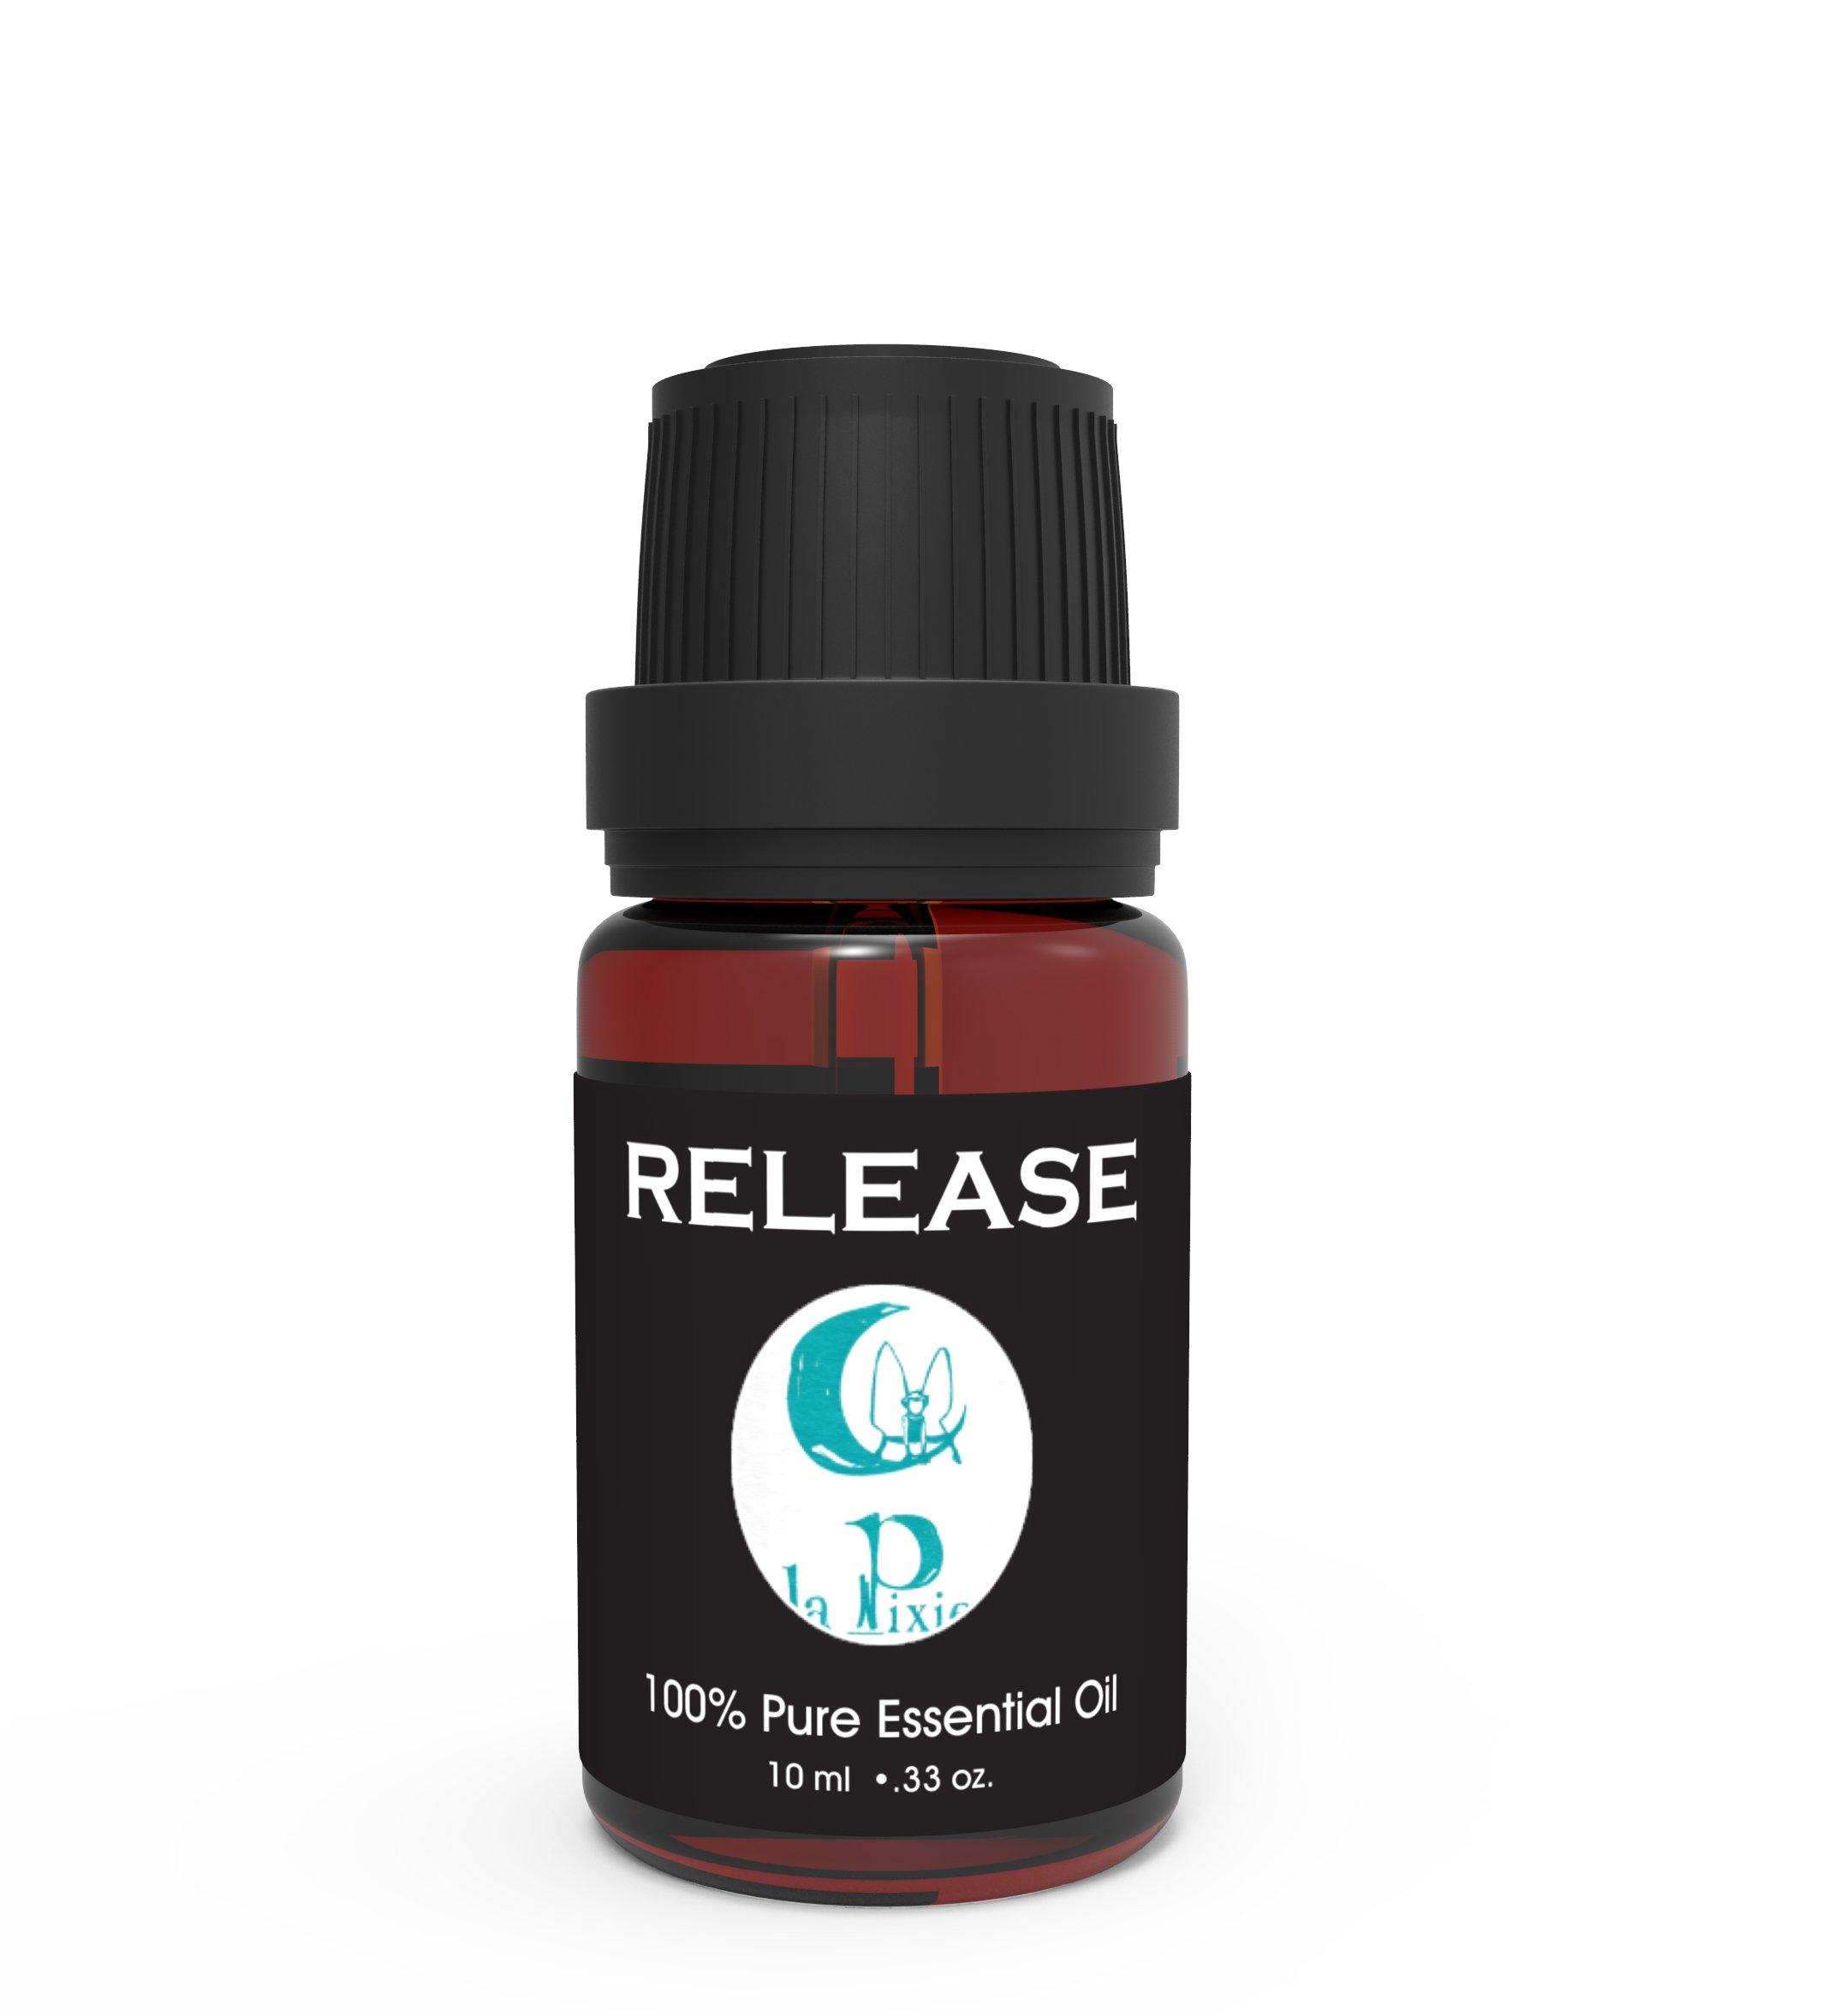 Headache and Migraine Assistance Relief Pure Essential Oil. 100% Pure, Undiluted, Therapeutic Grade, Citronella, Lemongrass, Rosemary, Lavindin.